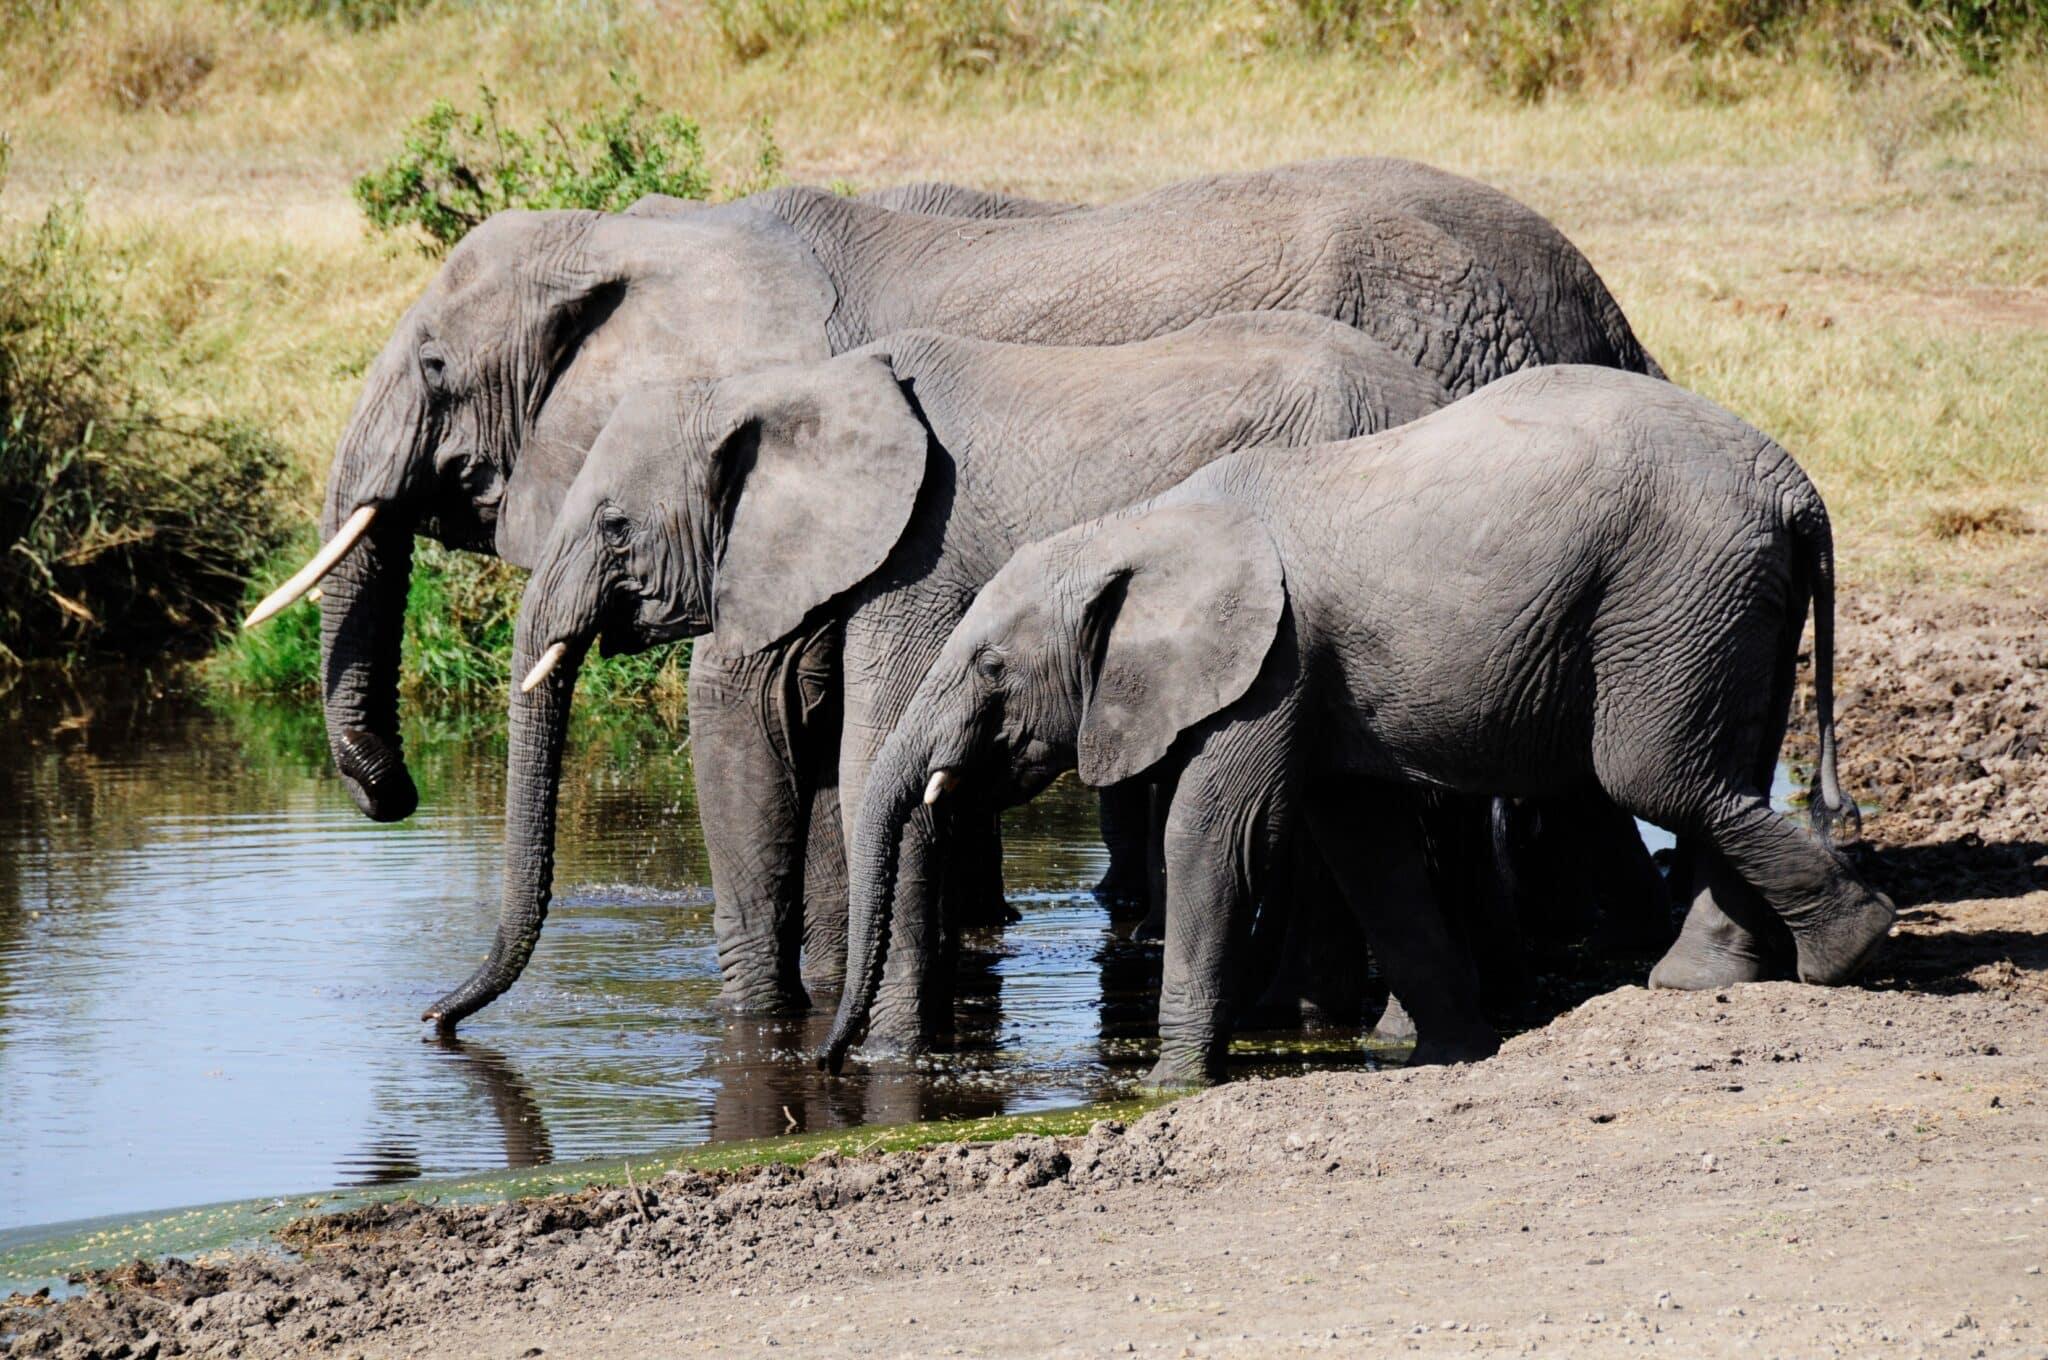 Africa; Tanzania; Serengeti National Park; Elephants_adobespark